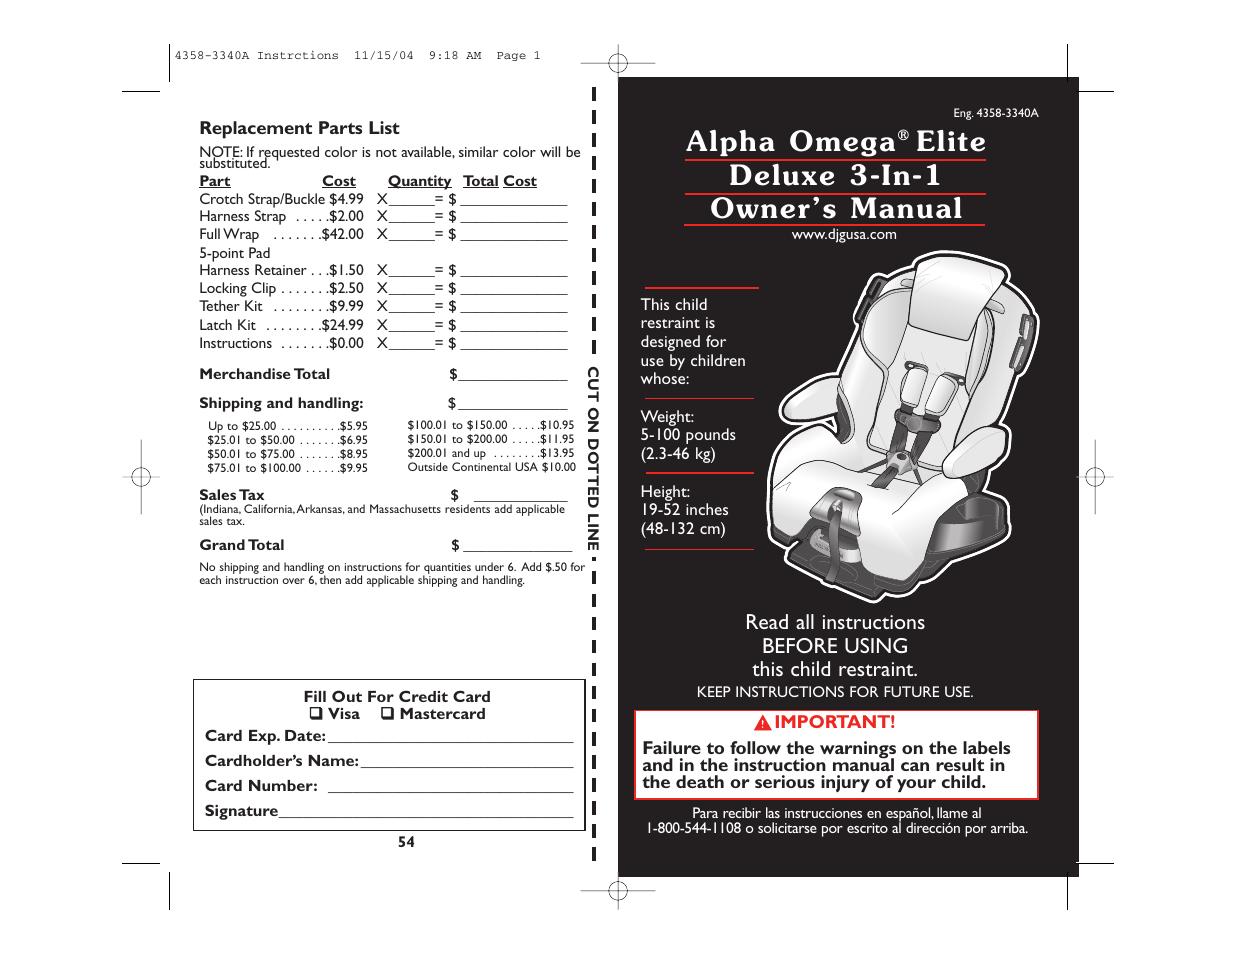 Alpha Omega Elite Owners Manual